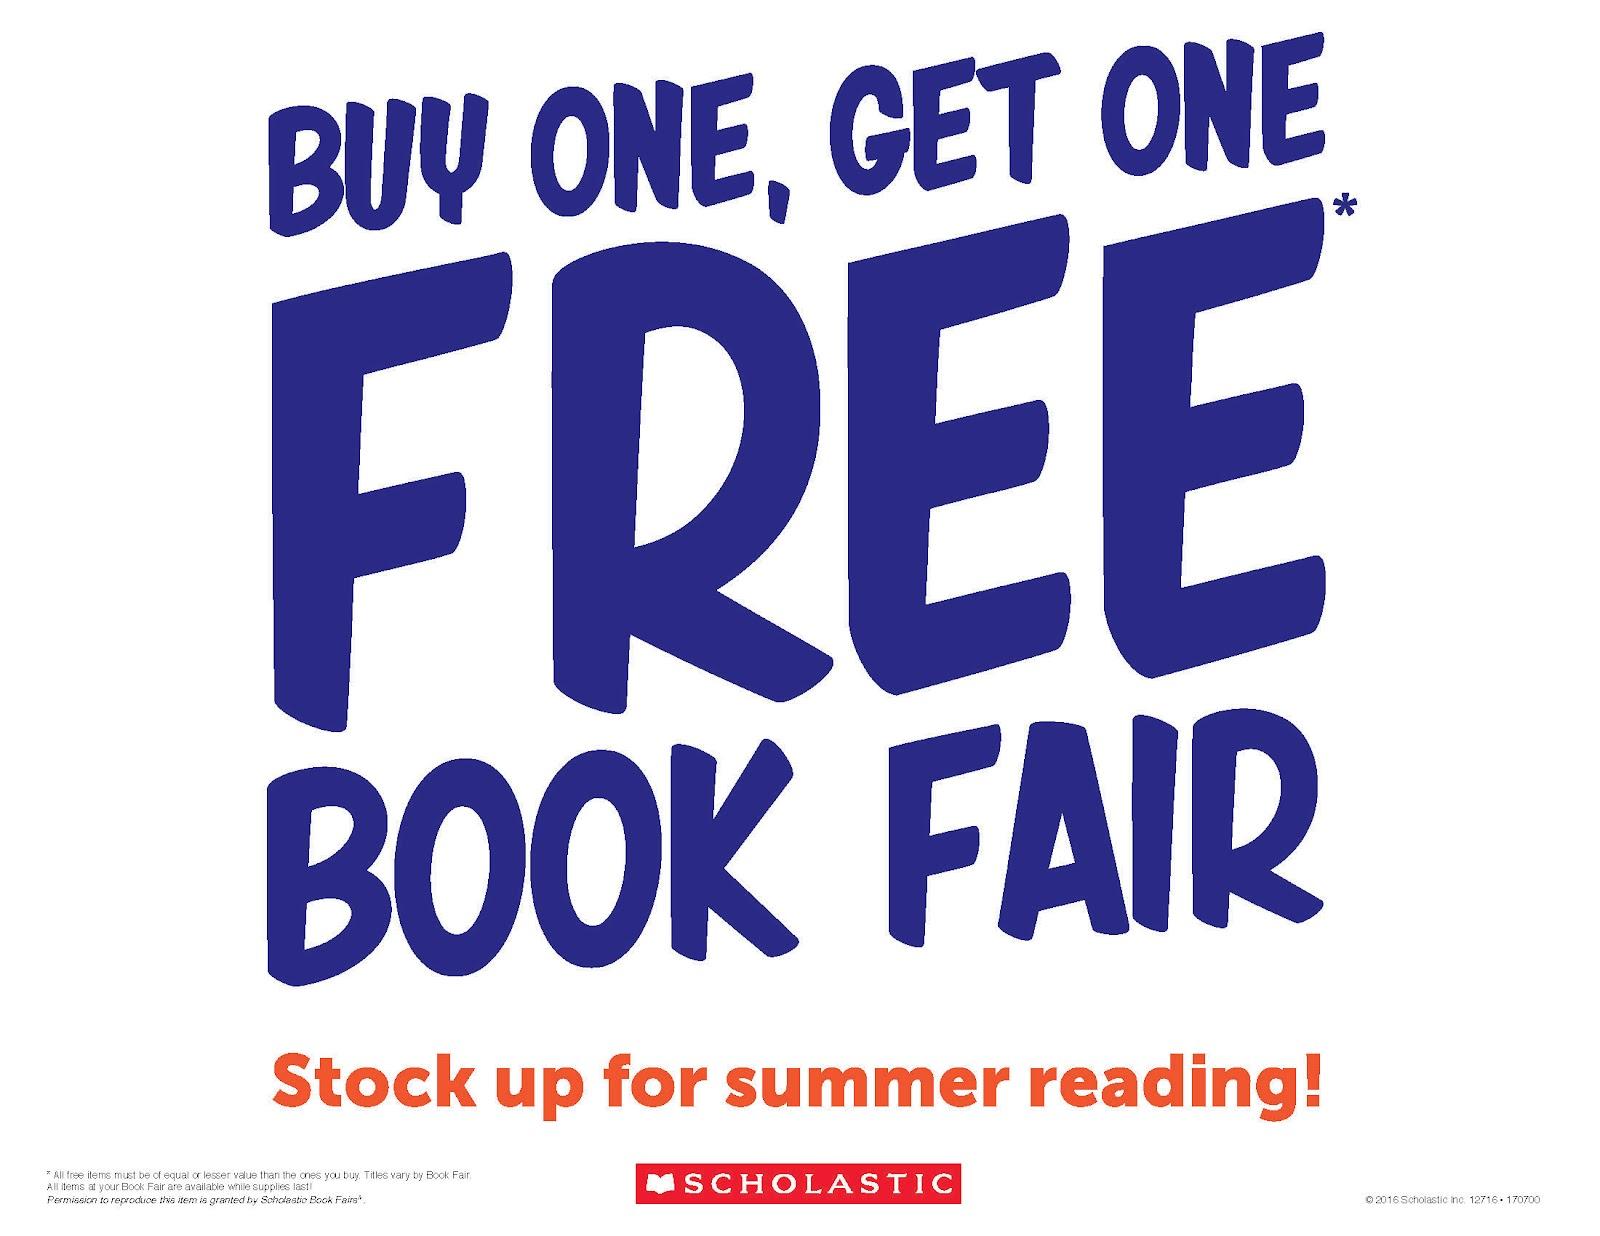 http://bookfairs.scholastic.com/bookfairs/cptoolkit/assetuploads/170700_bogo_logo.jpg.jpg